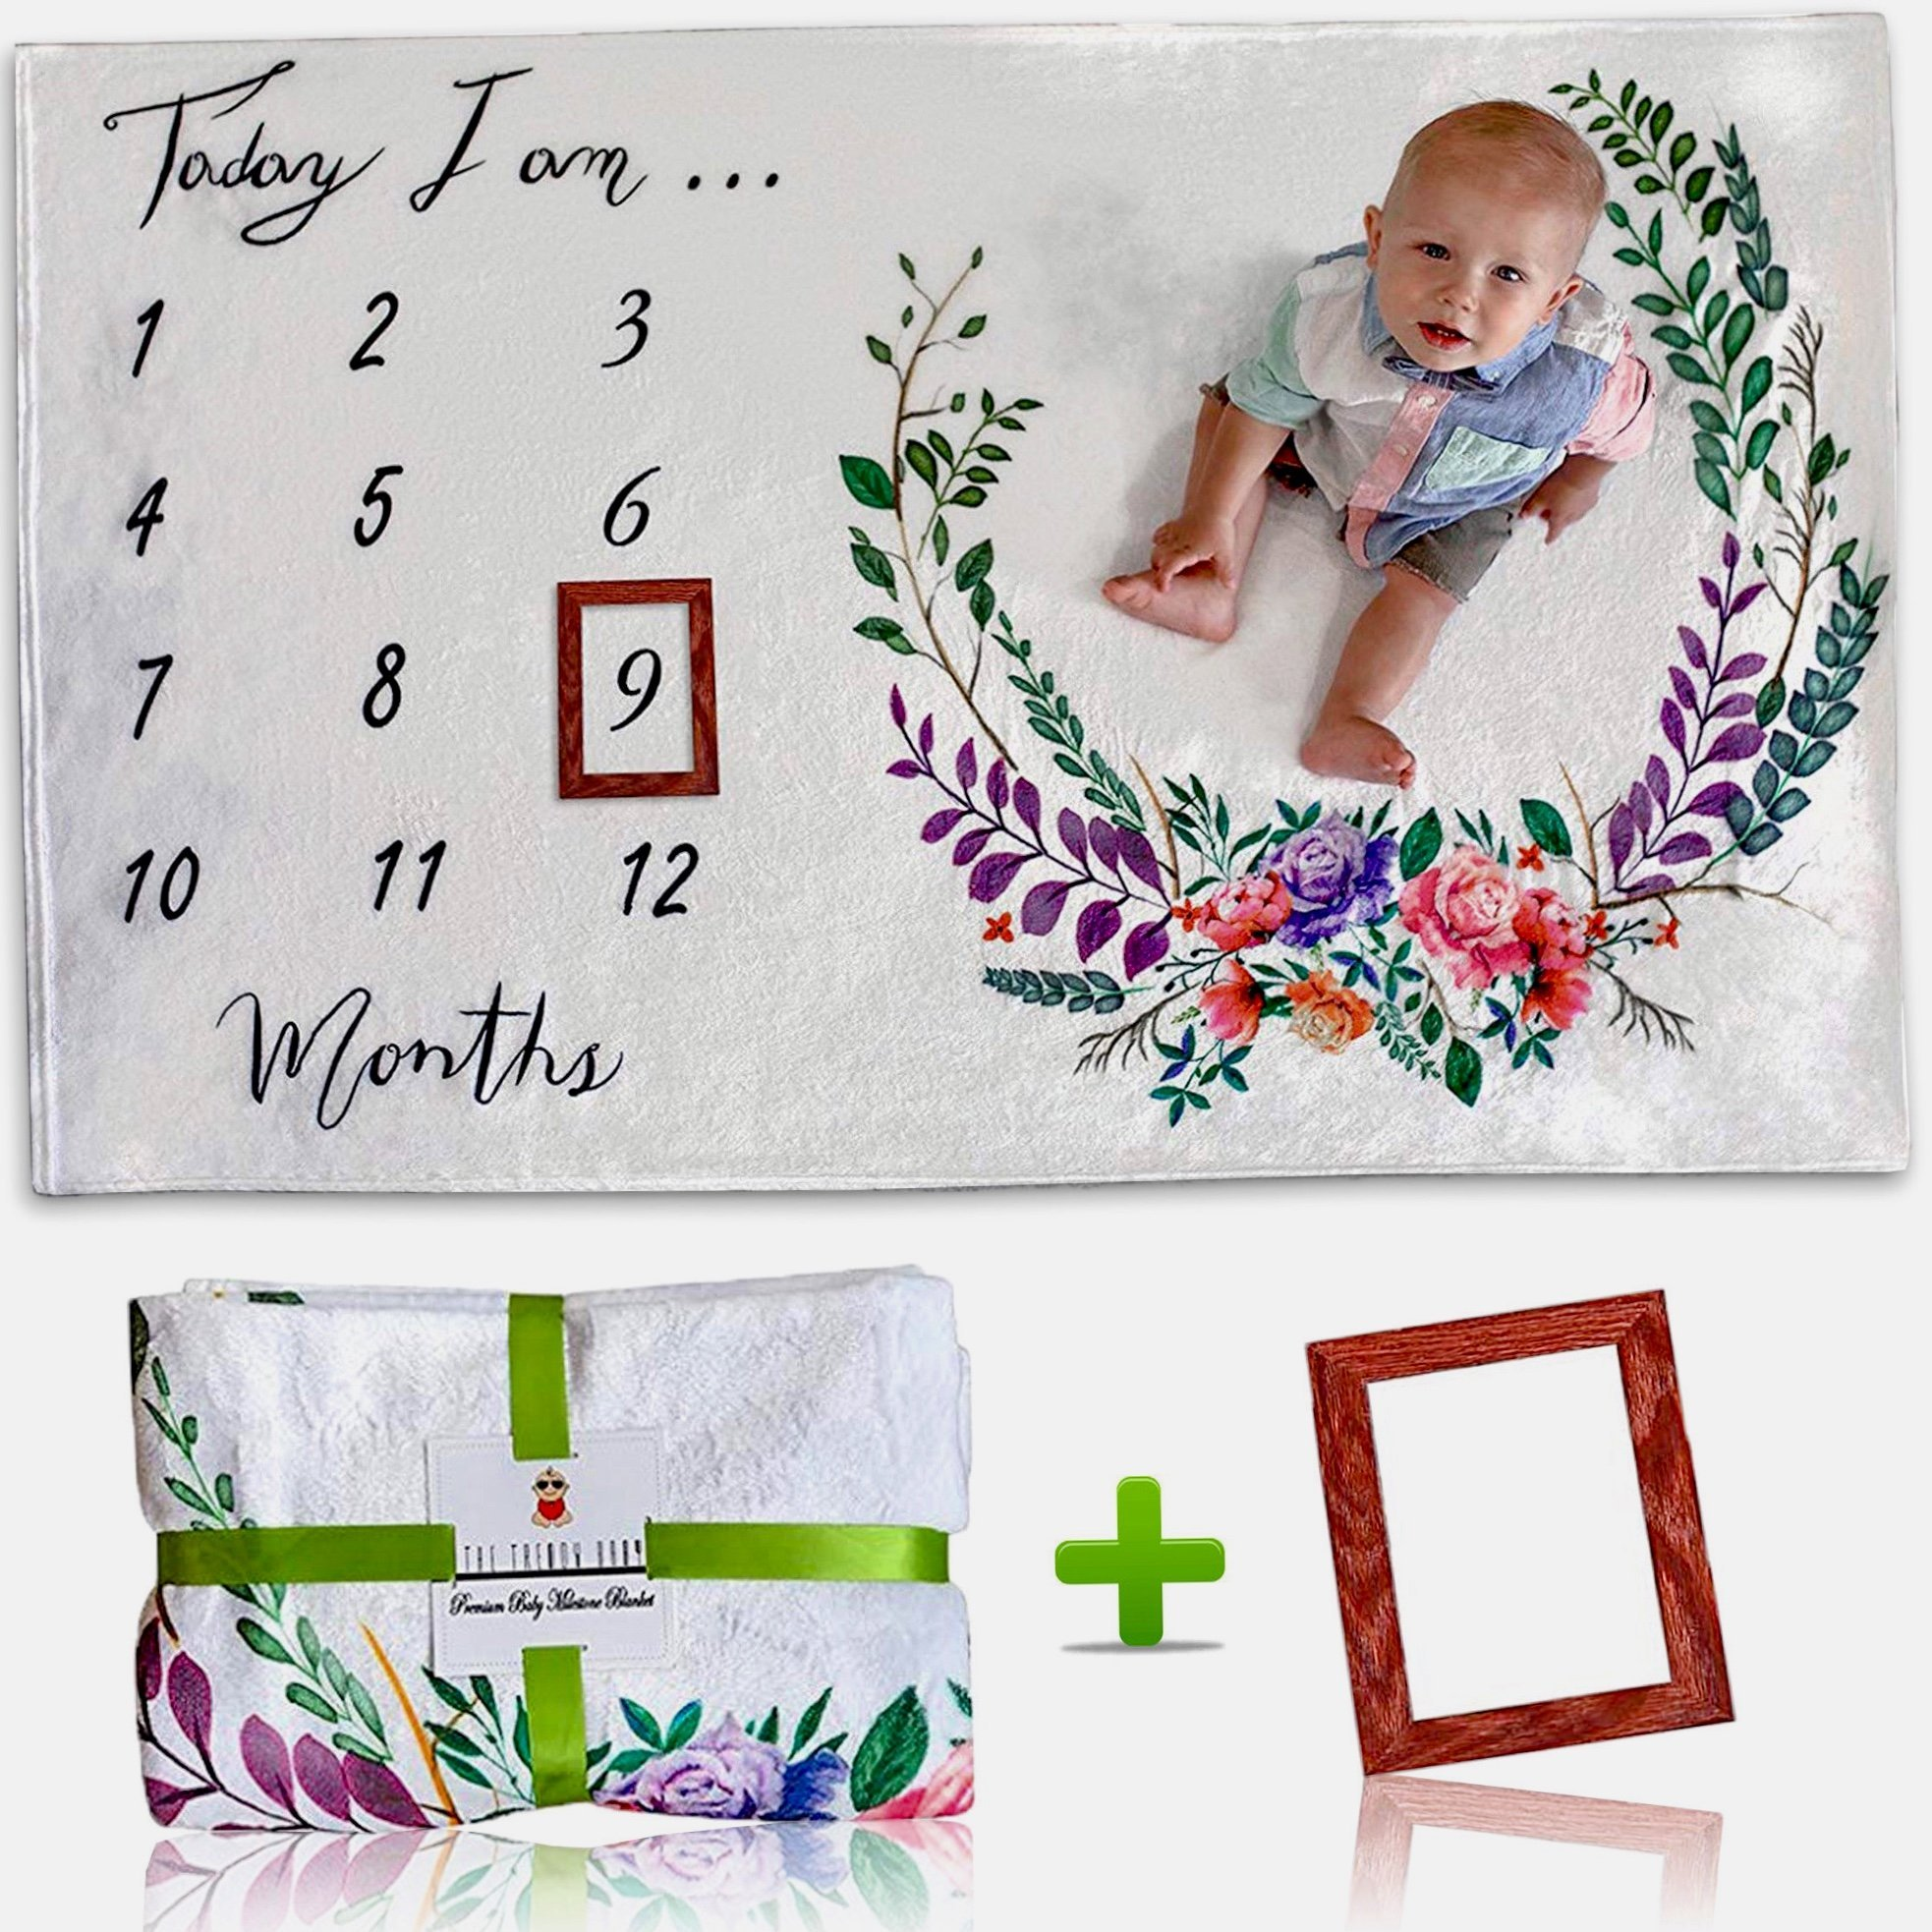 [Upgrade Version] Premium Monthly Baby Milestone Blanket w/Bonus Wooden Style Frame | Ultra Soft (Upgraded 250gsm) Fleece Blanket | Large 60x40 Size | Best Newborn or Baby Shower Gift for Boy or Girl